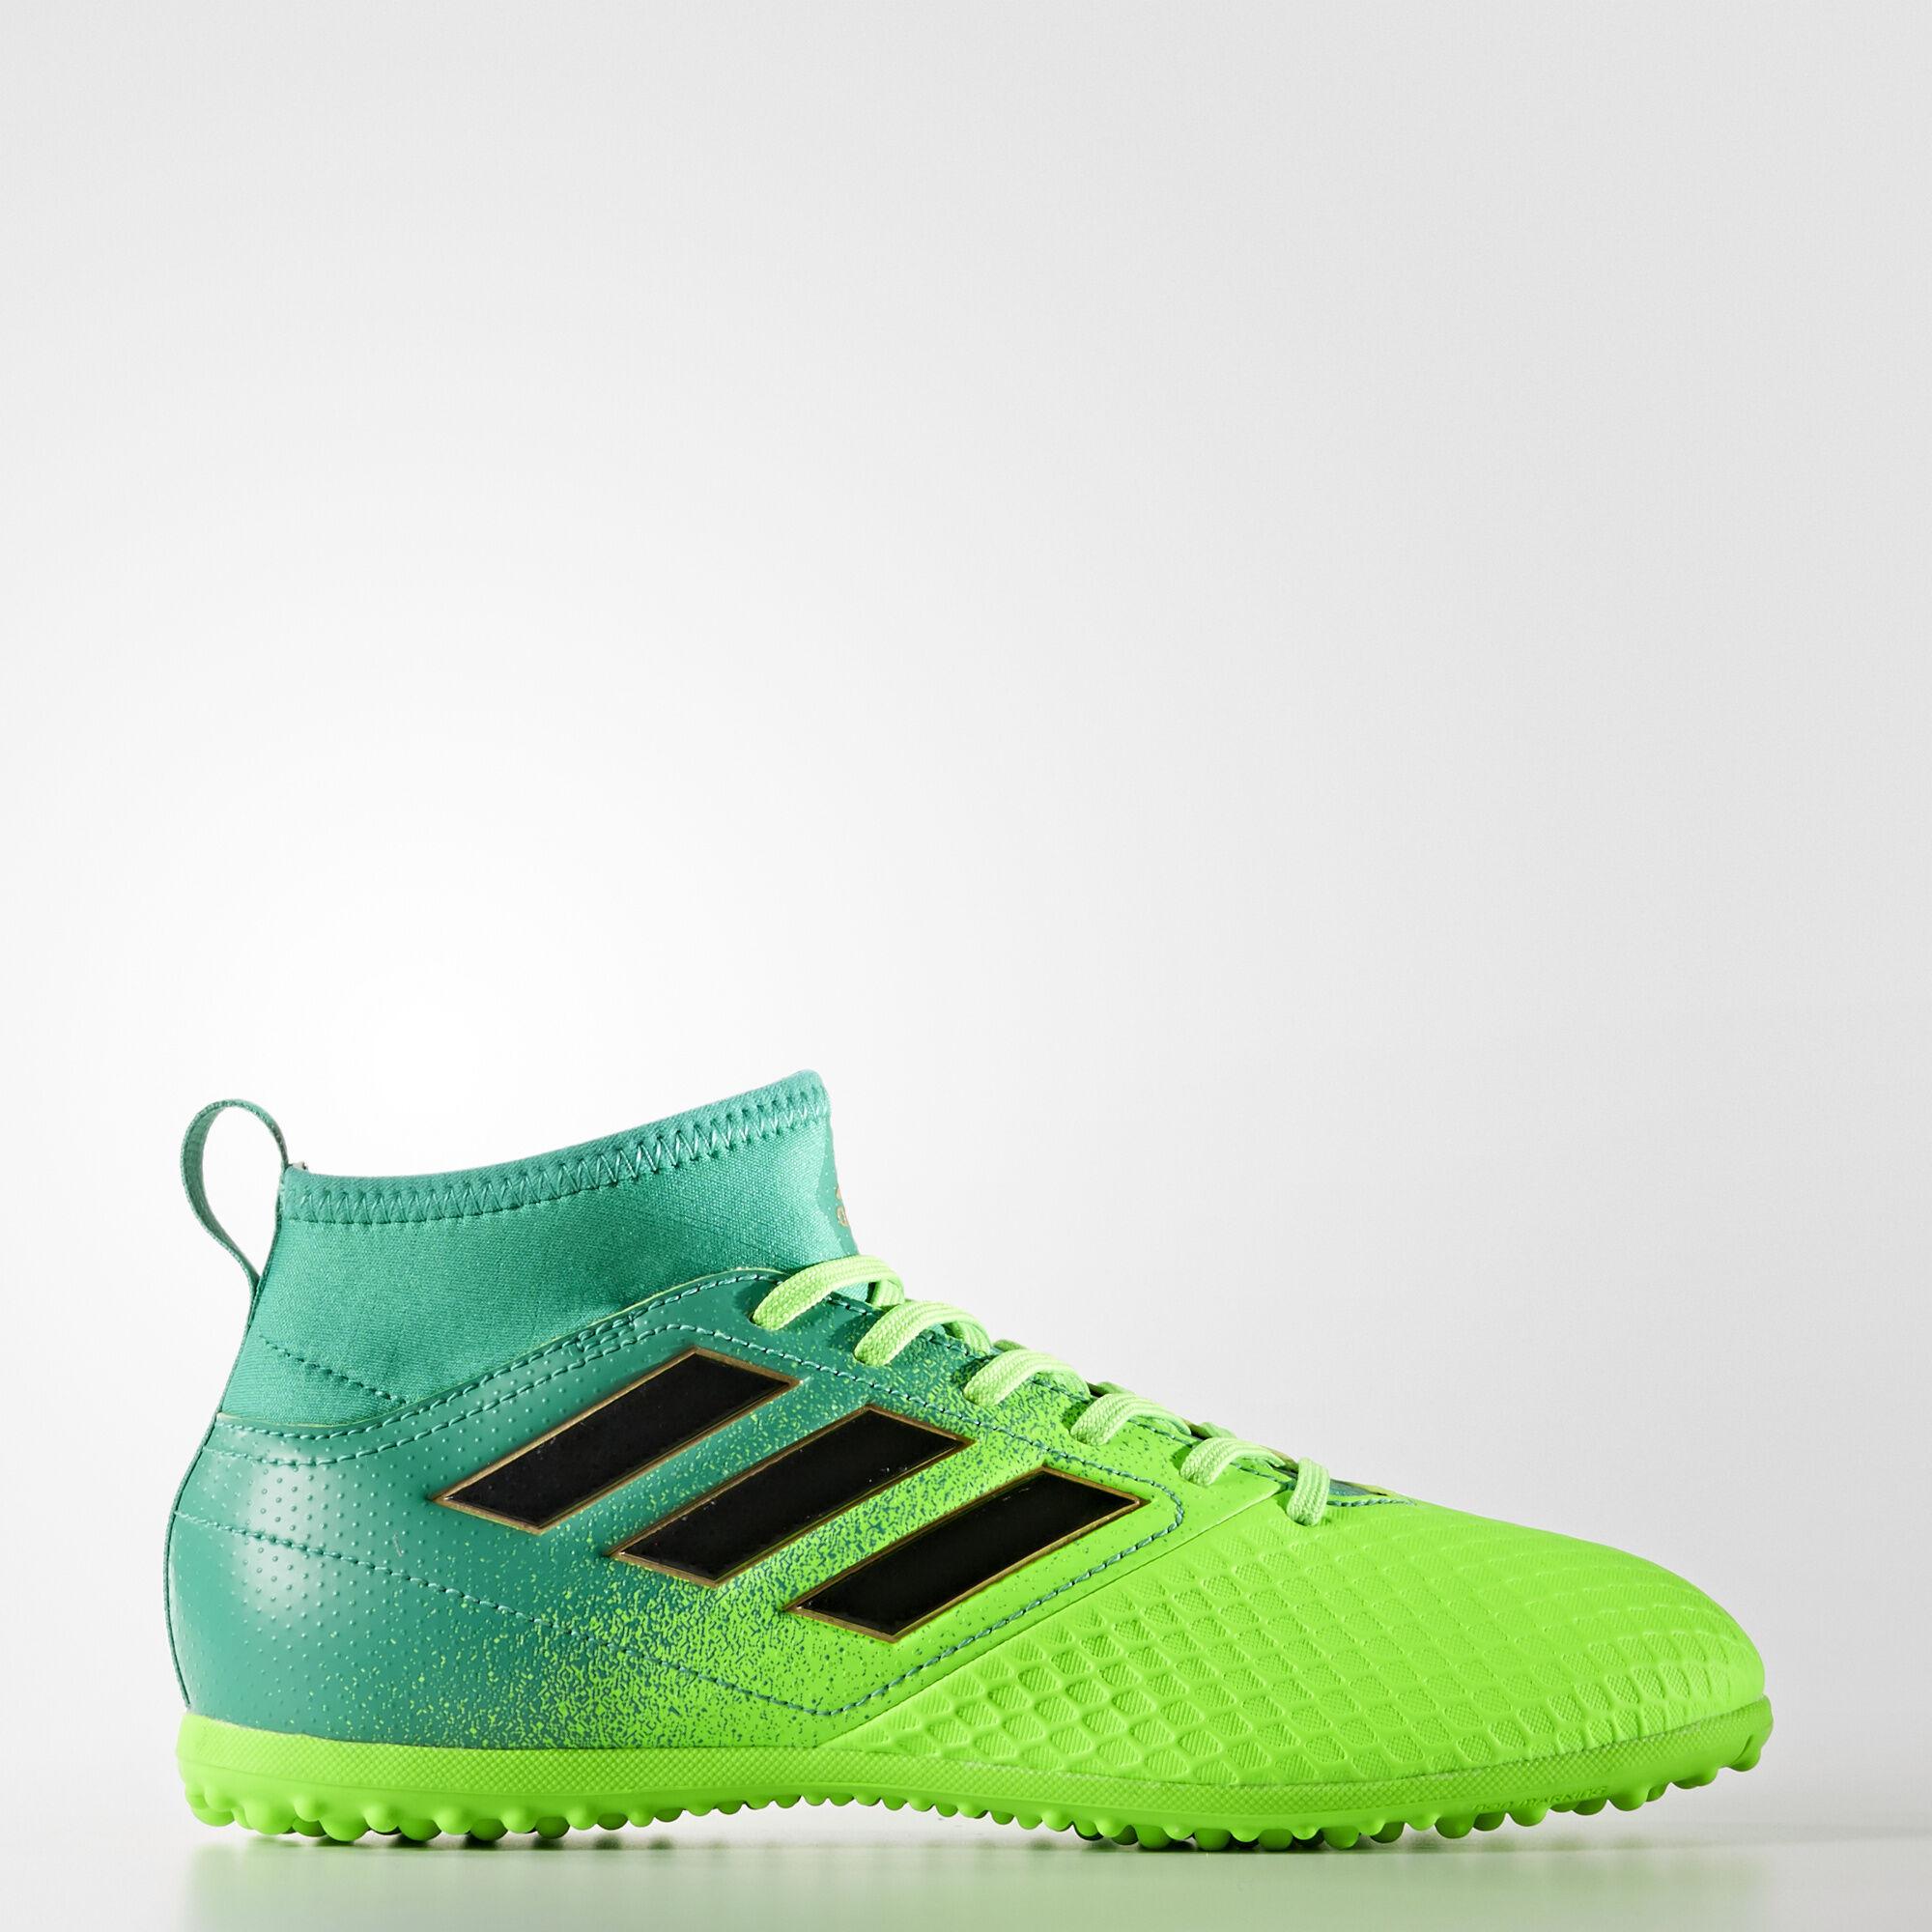 Adidas Ace 17.3 Primemesh Turf